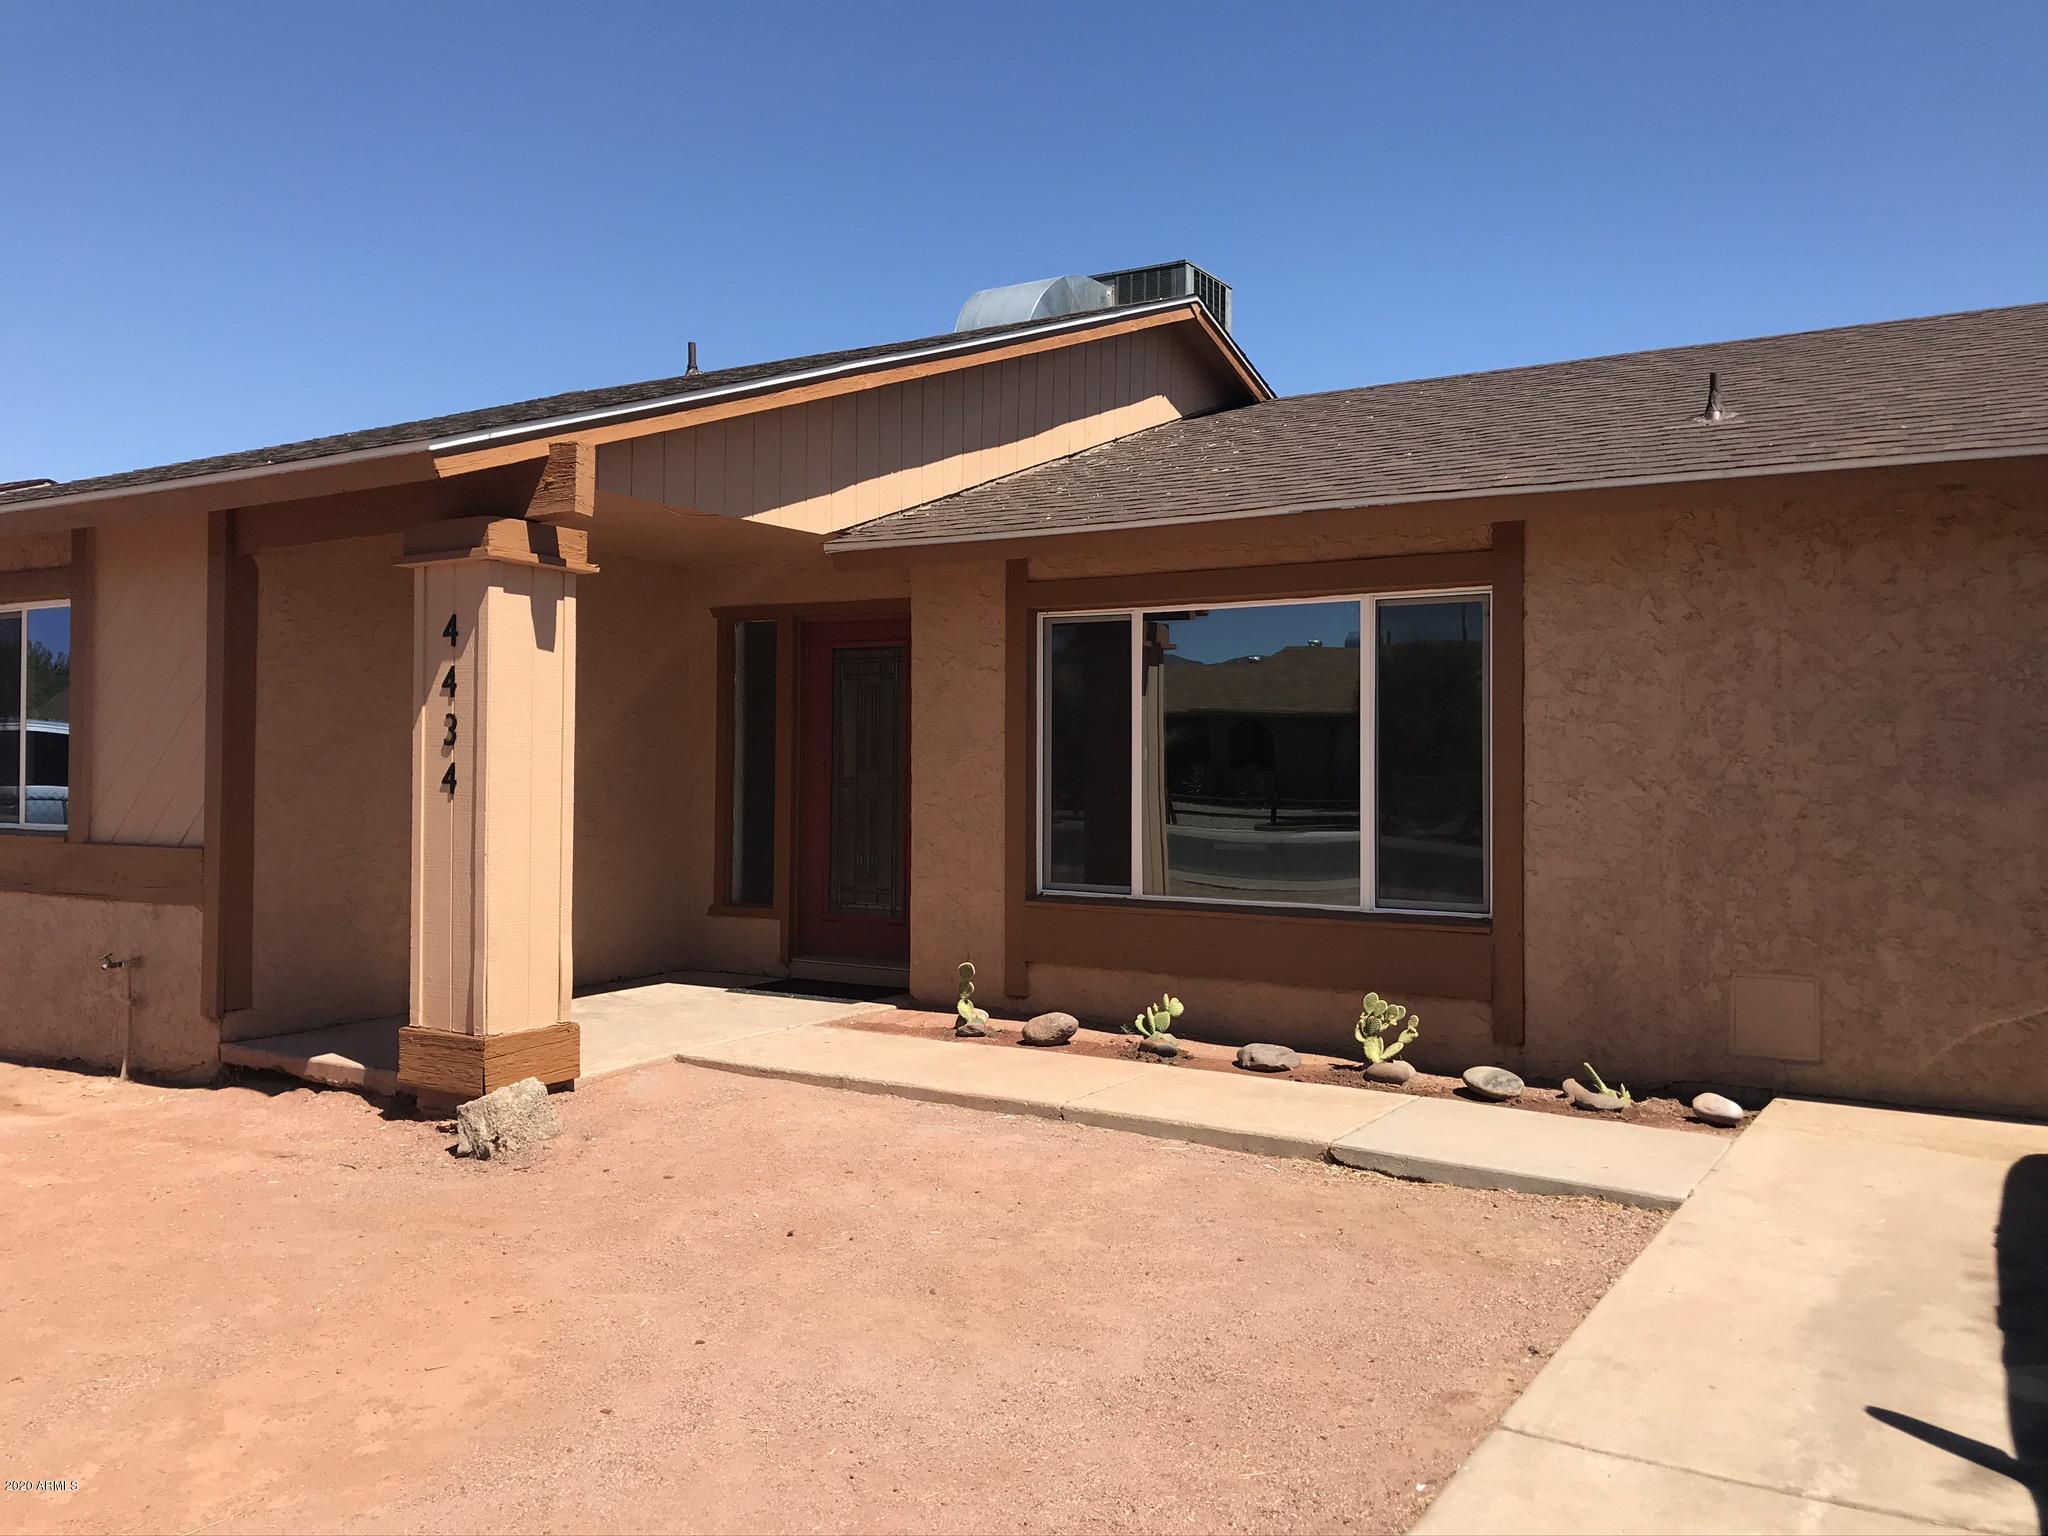 MLS 6108990 Phoenix Metro Area, Phoenix, AZ 85040 Equestrian Homes in Phoenix